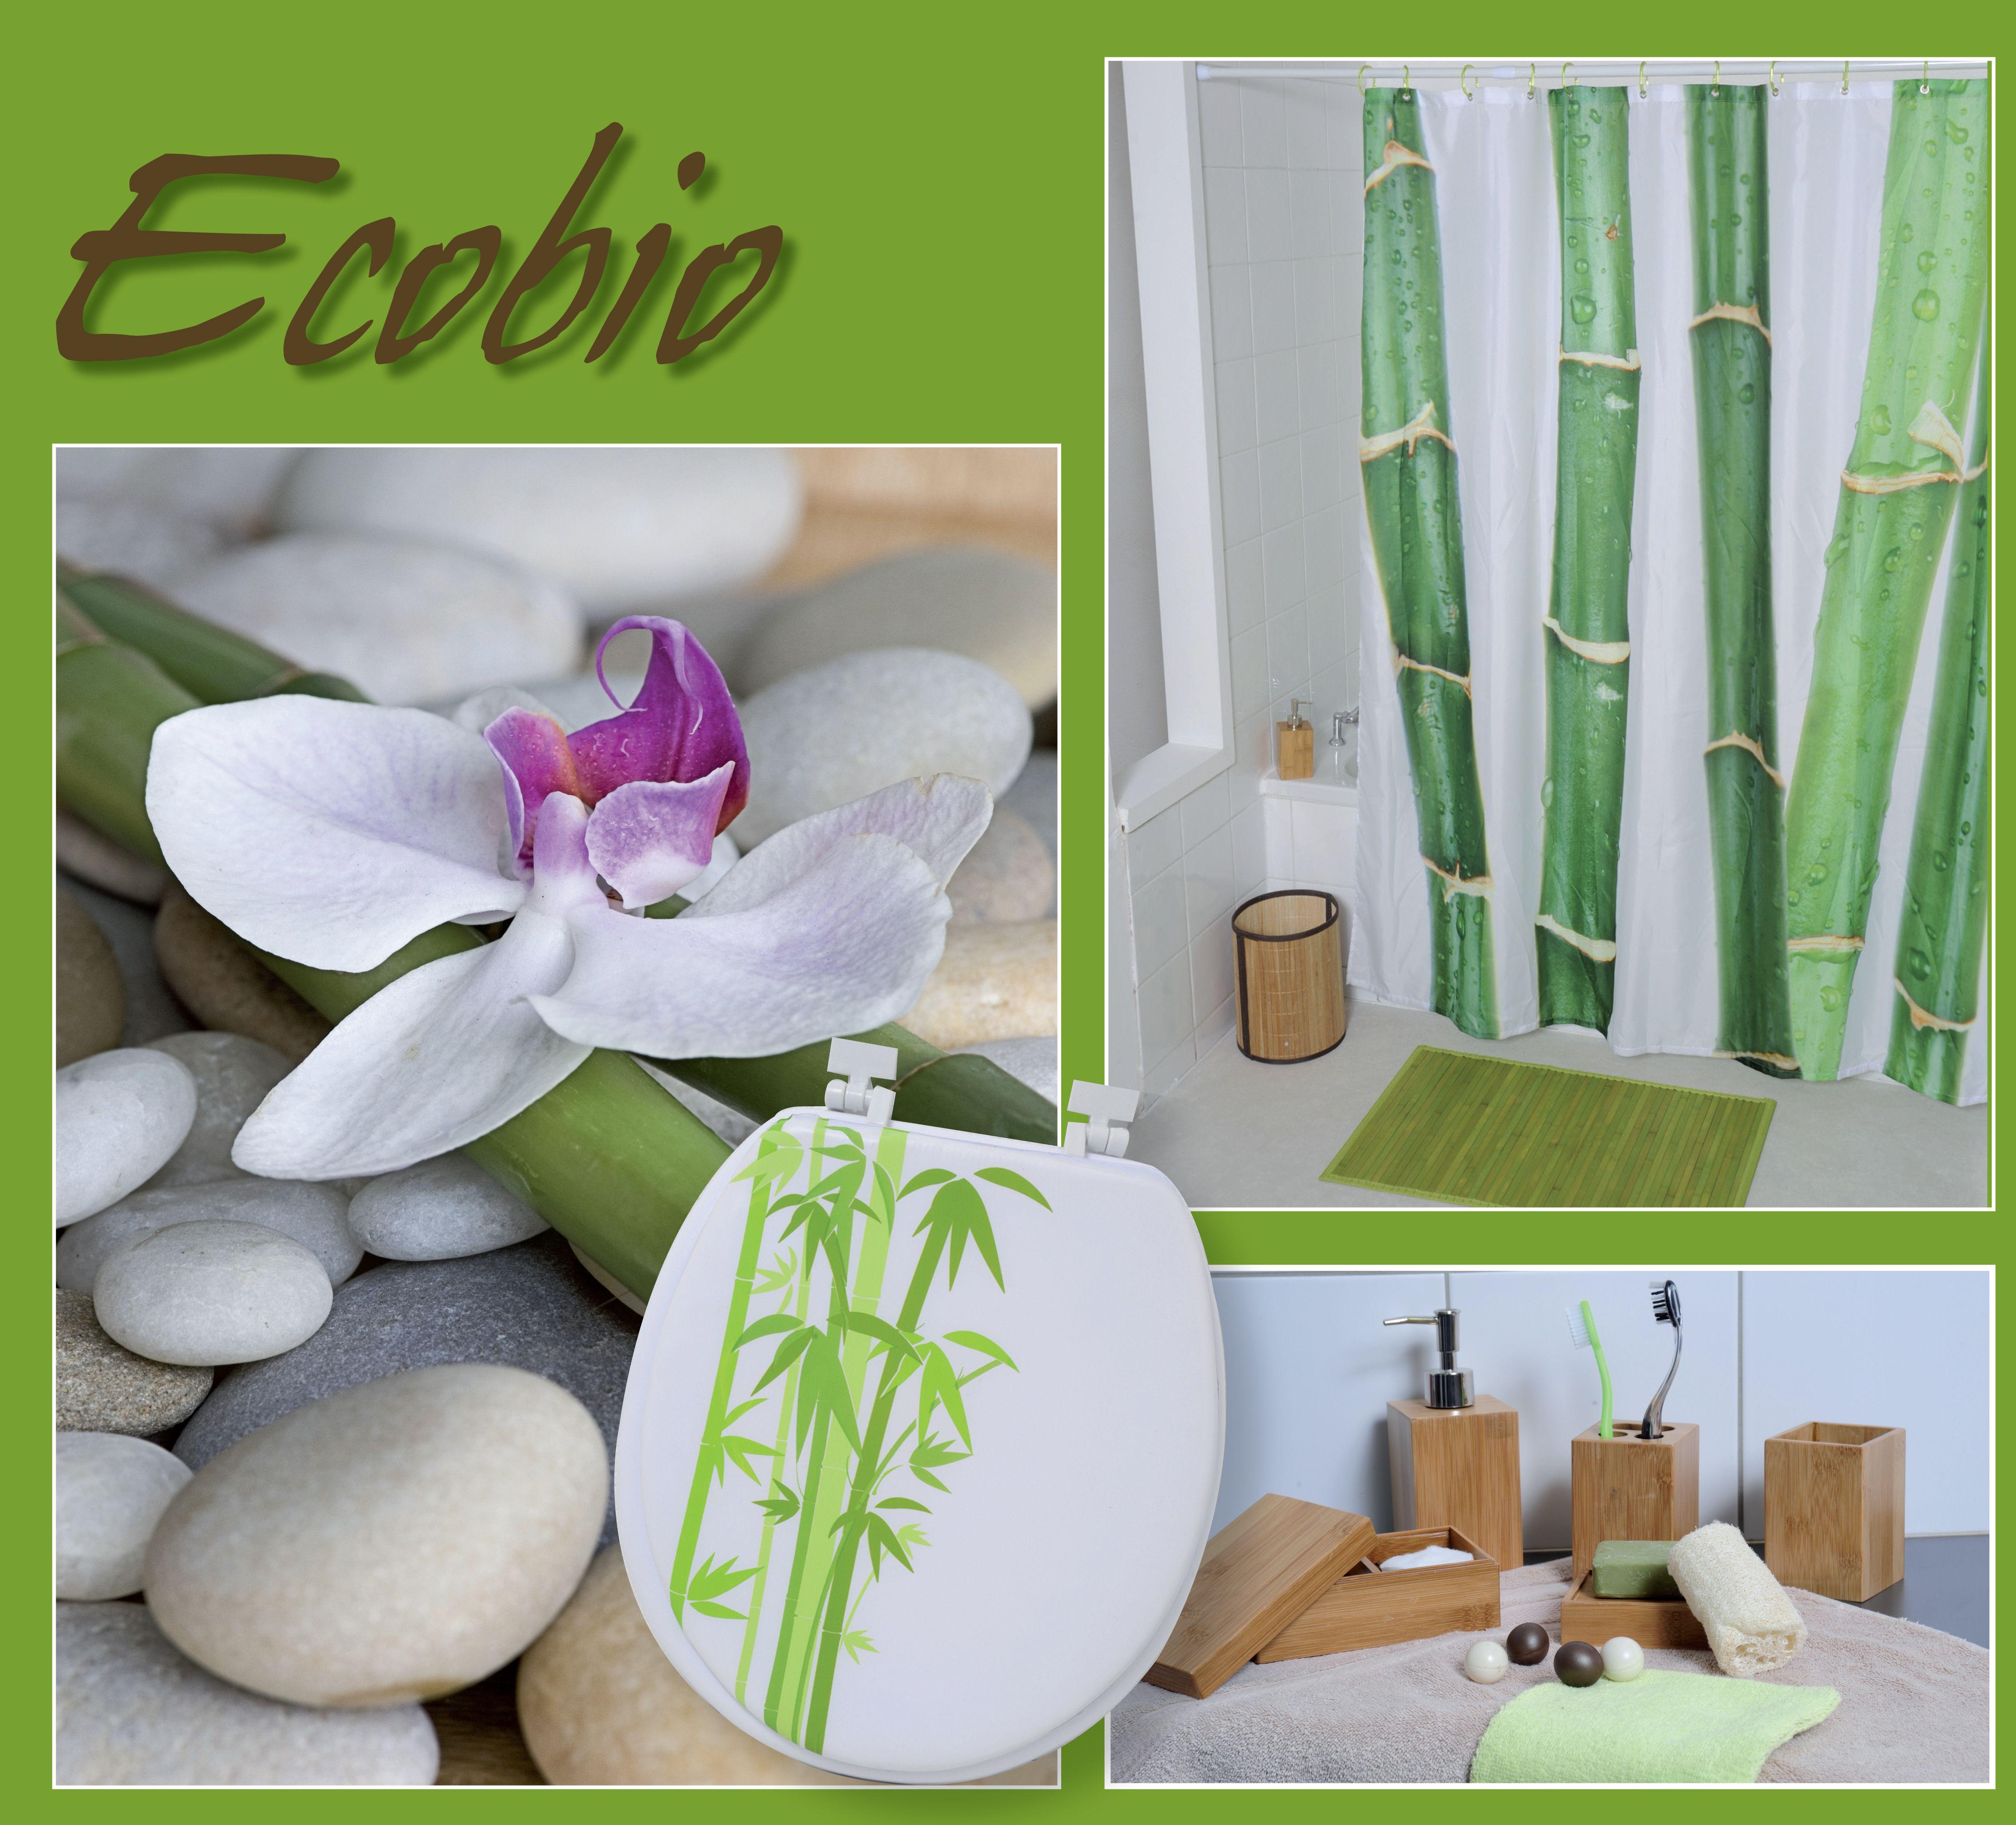 COLLECTION ECOBIO | Bamboo bathroom, Table decorations, Decor